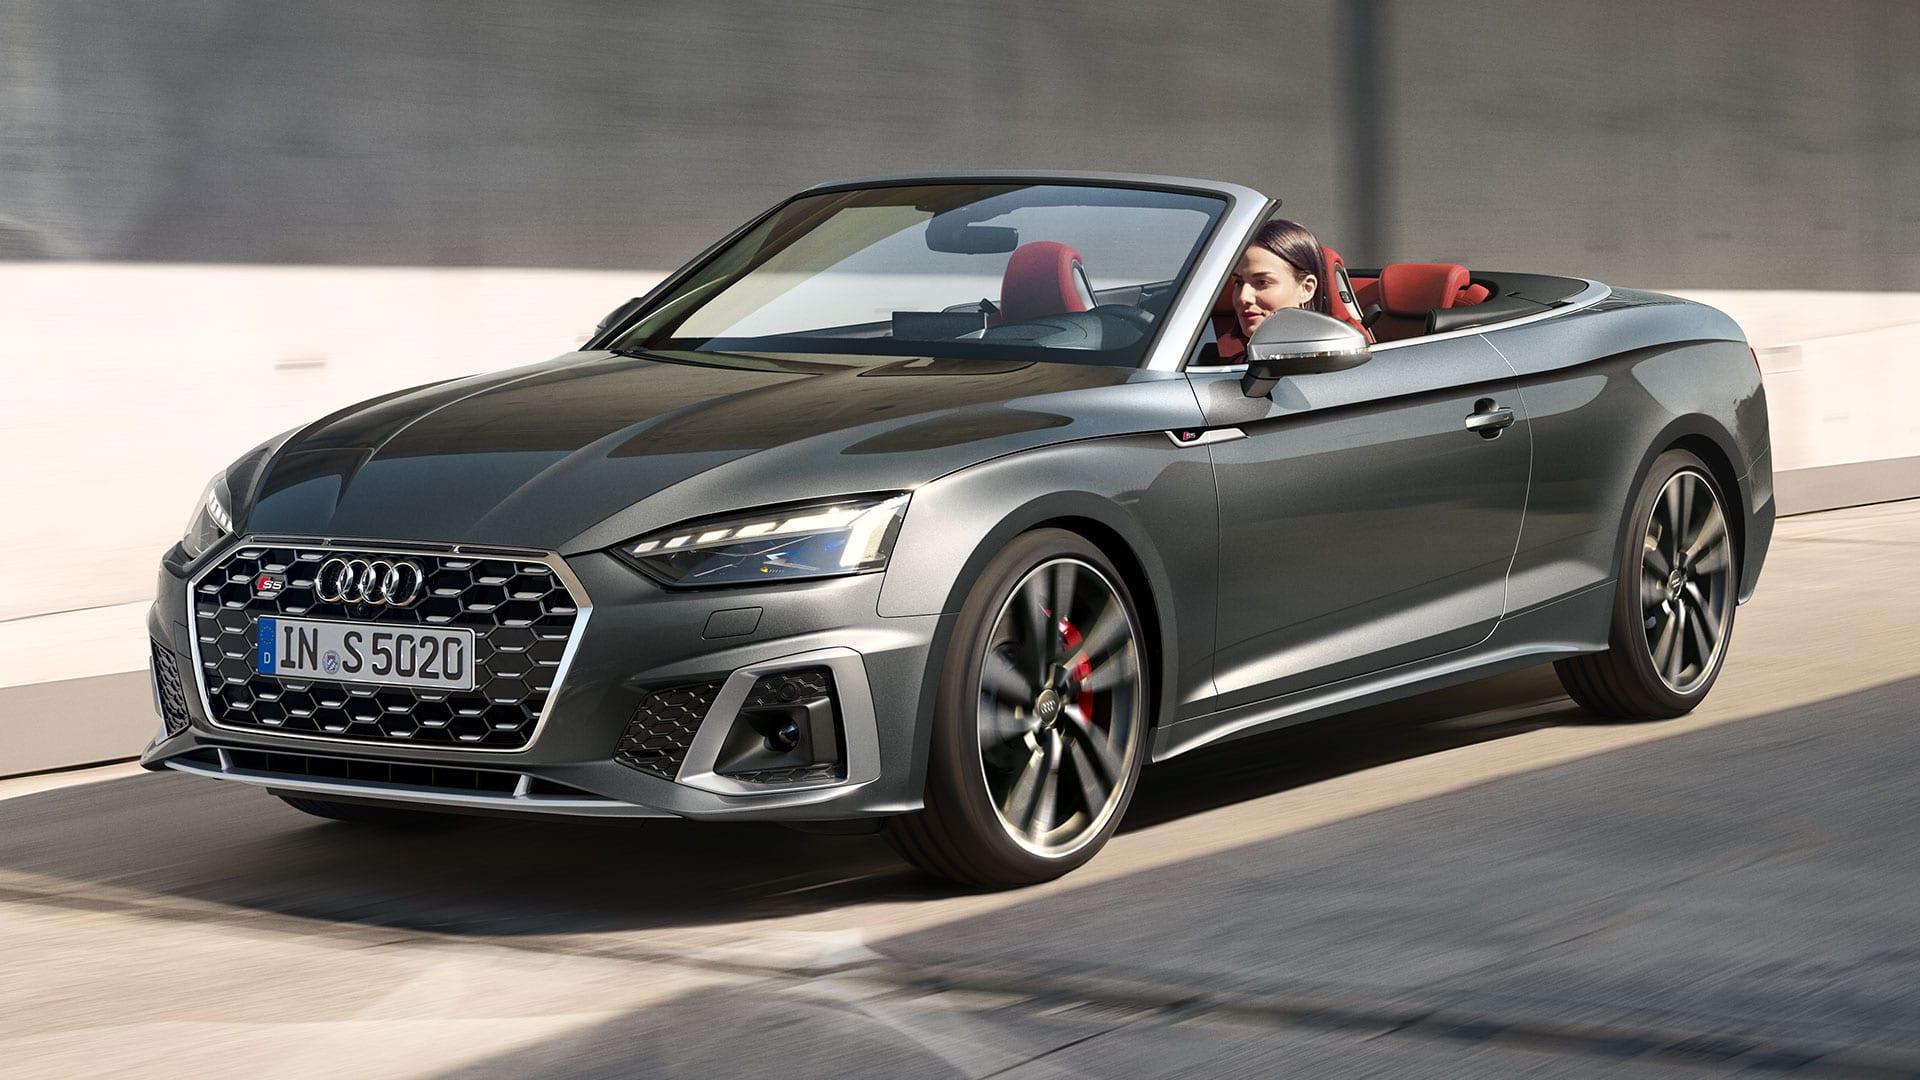 2020 Audi S5 Cabriolet Spy Shoot